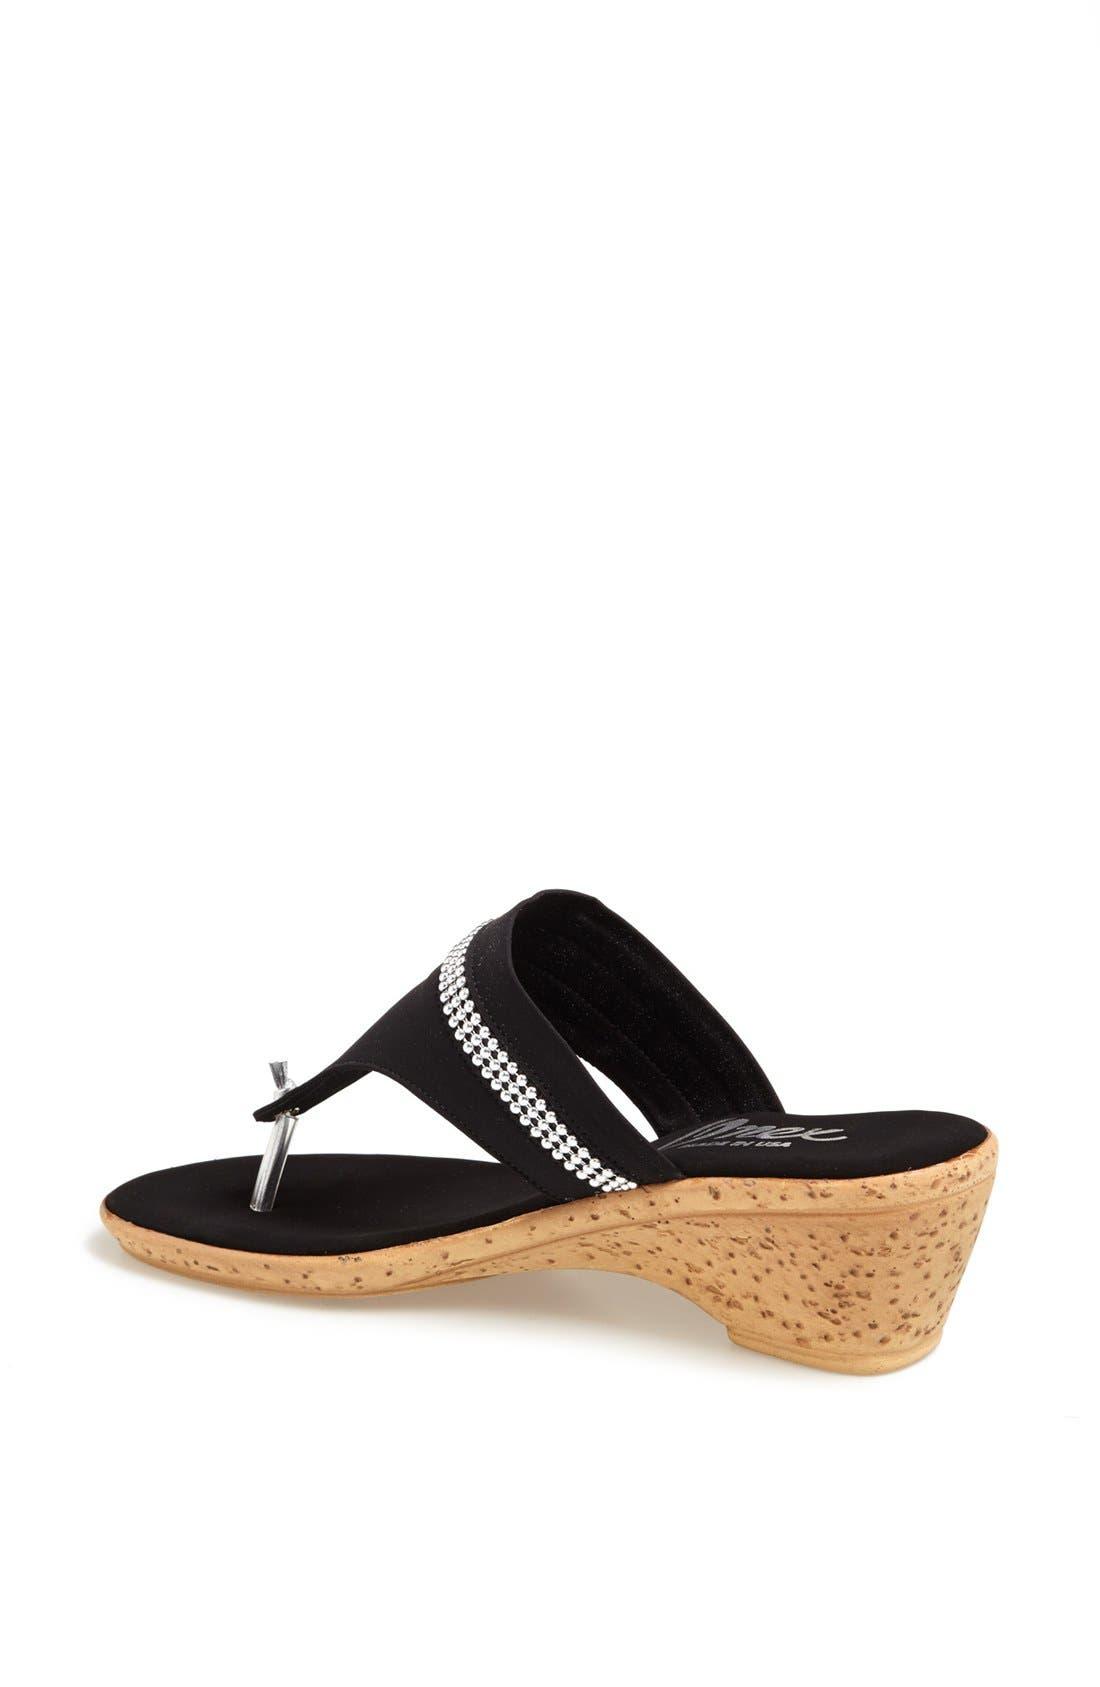 Alternate Image 2  - Onex 'Tory' Wedge Sandal